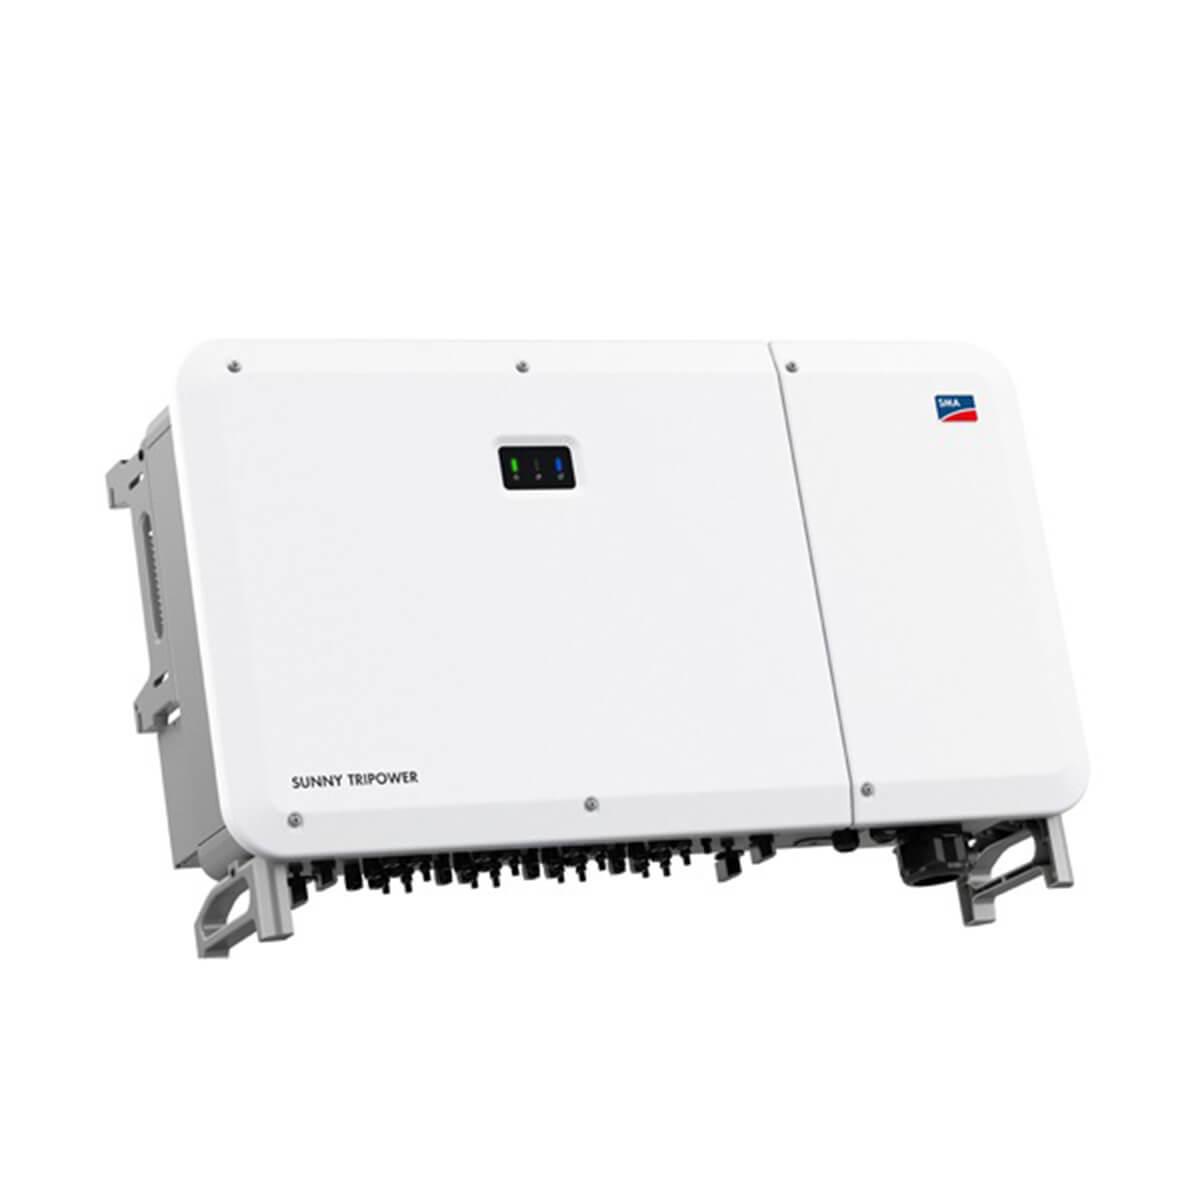 sma 110kW inverter, sma sunny tripower 110kW inverter, sma sunny tripower core2 inverter, sma sunny tripower core2, sma sunny tripower 110 kW, SMA 110KW